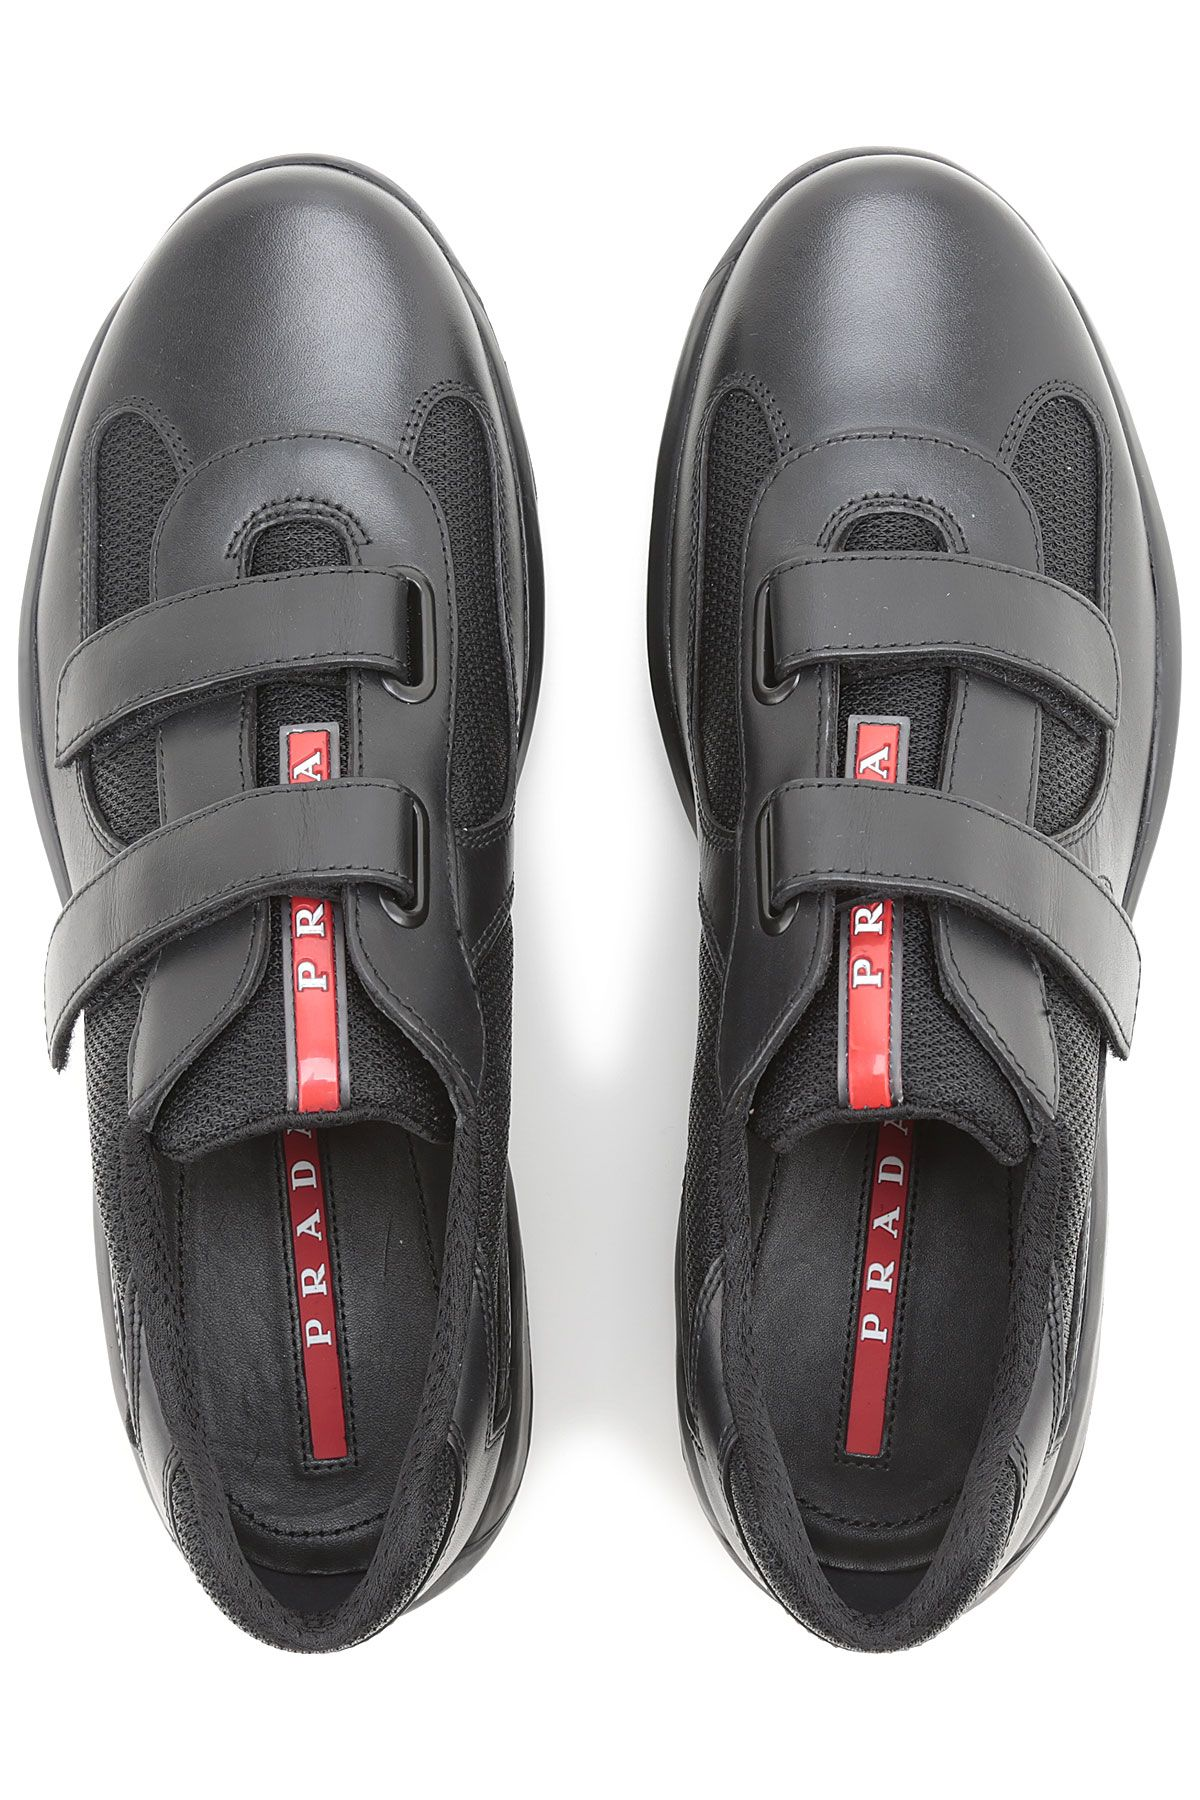 deefeb5832 ... ireland pin by ghassan jean on mens footwear pinterest prada men and  d7fb5 d658d